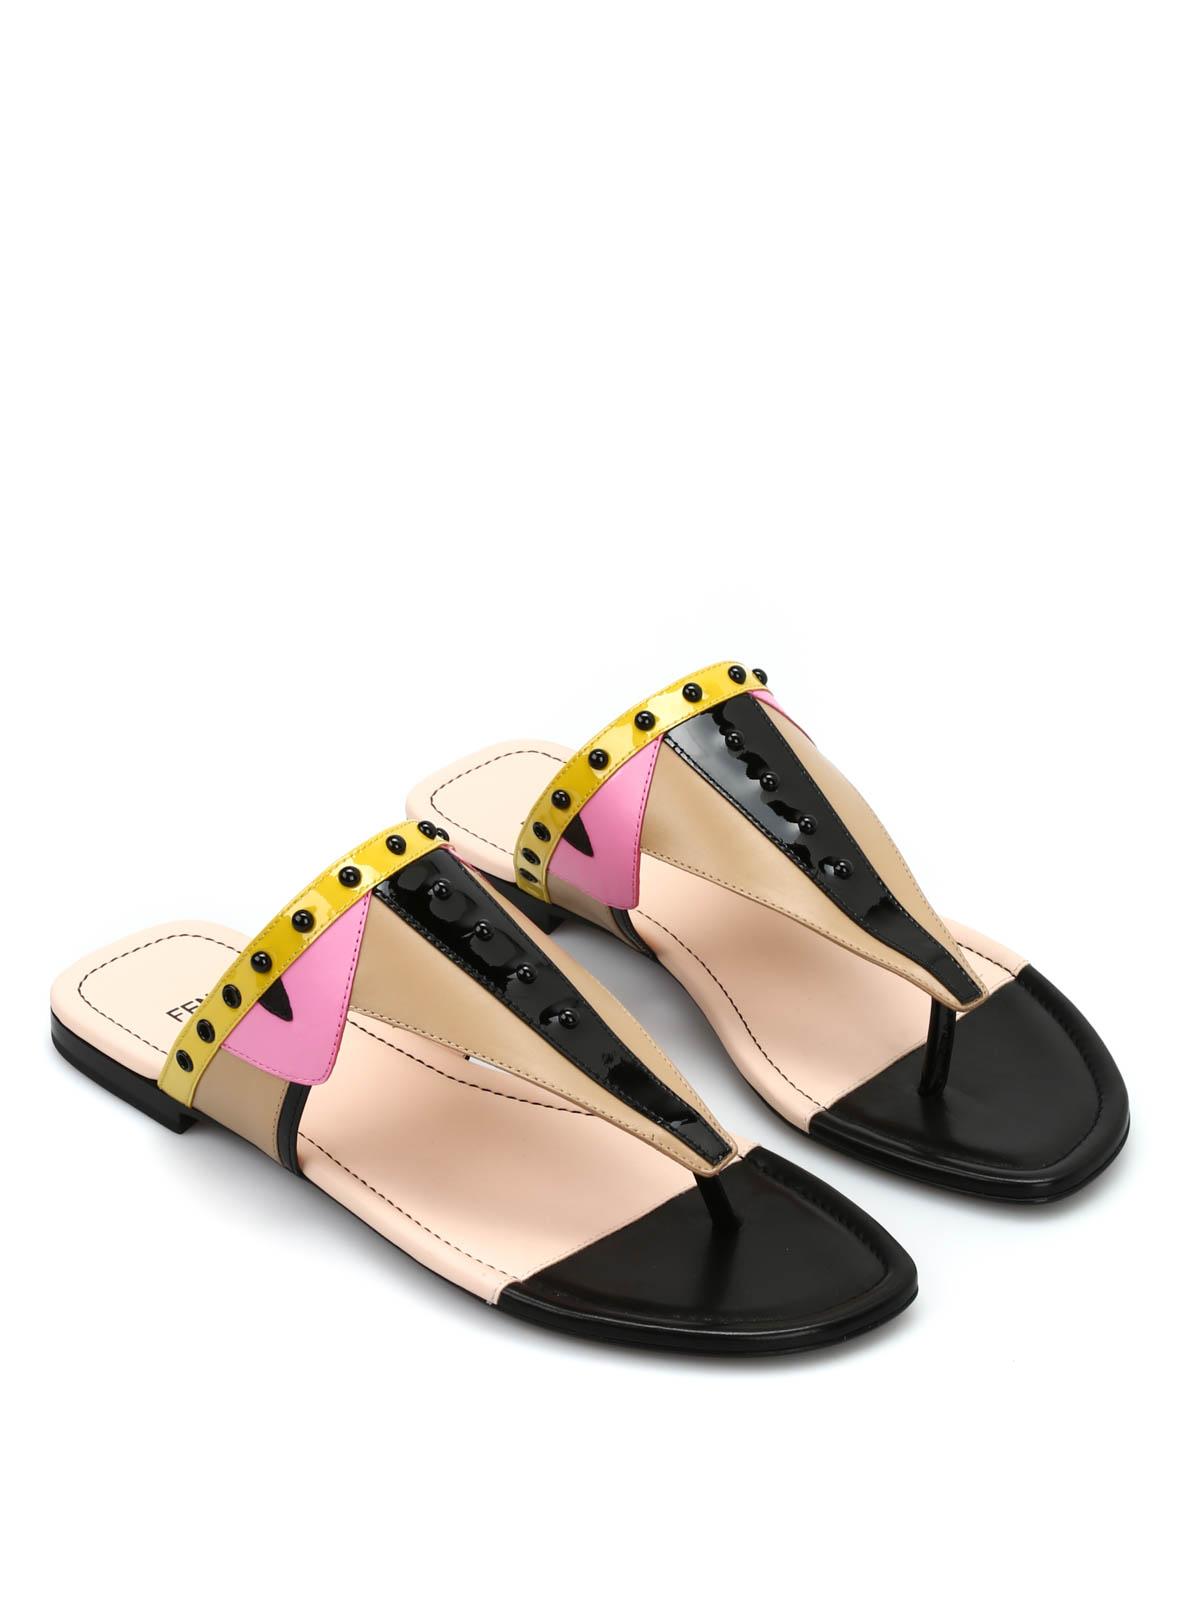 55402d0cb82e1 Fendi - Flip flops sandals - صندل - 8Y5165 5HK F0814